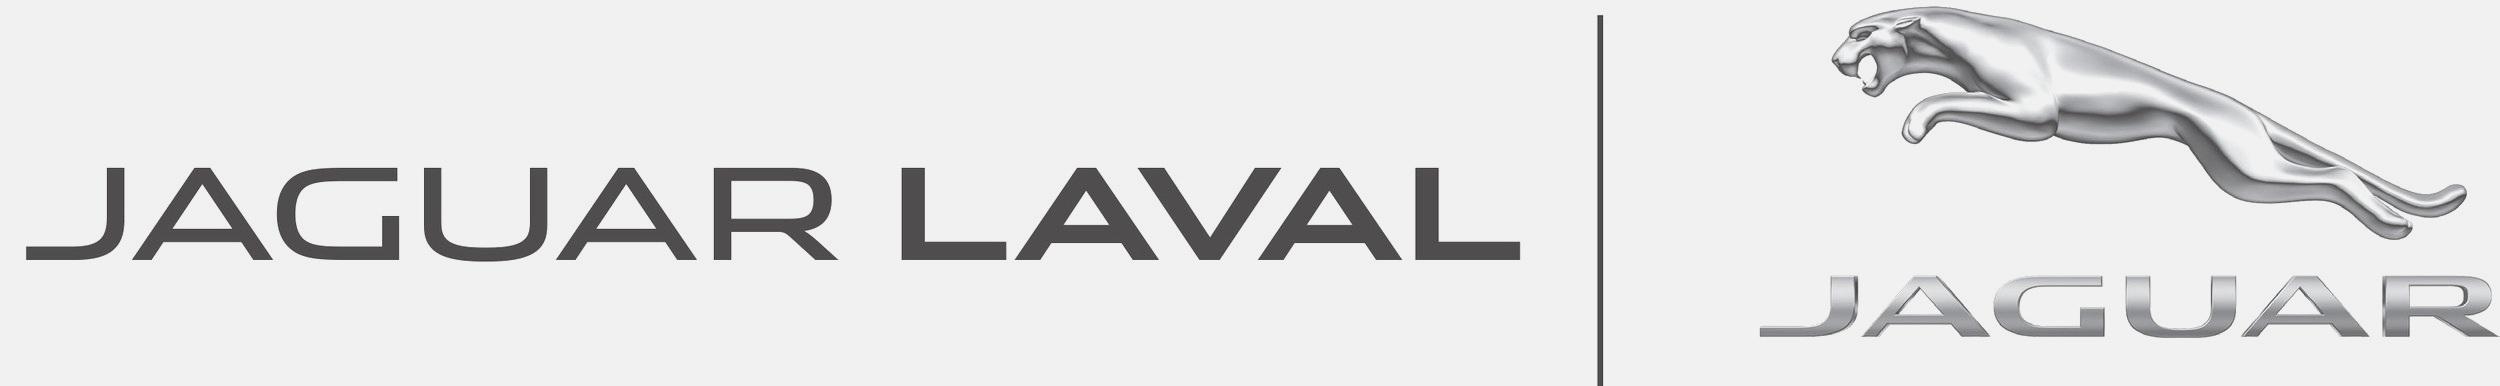 Event-Logo-Jaguar-Laval.jpg